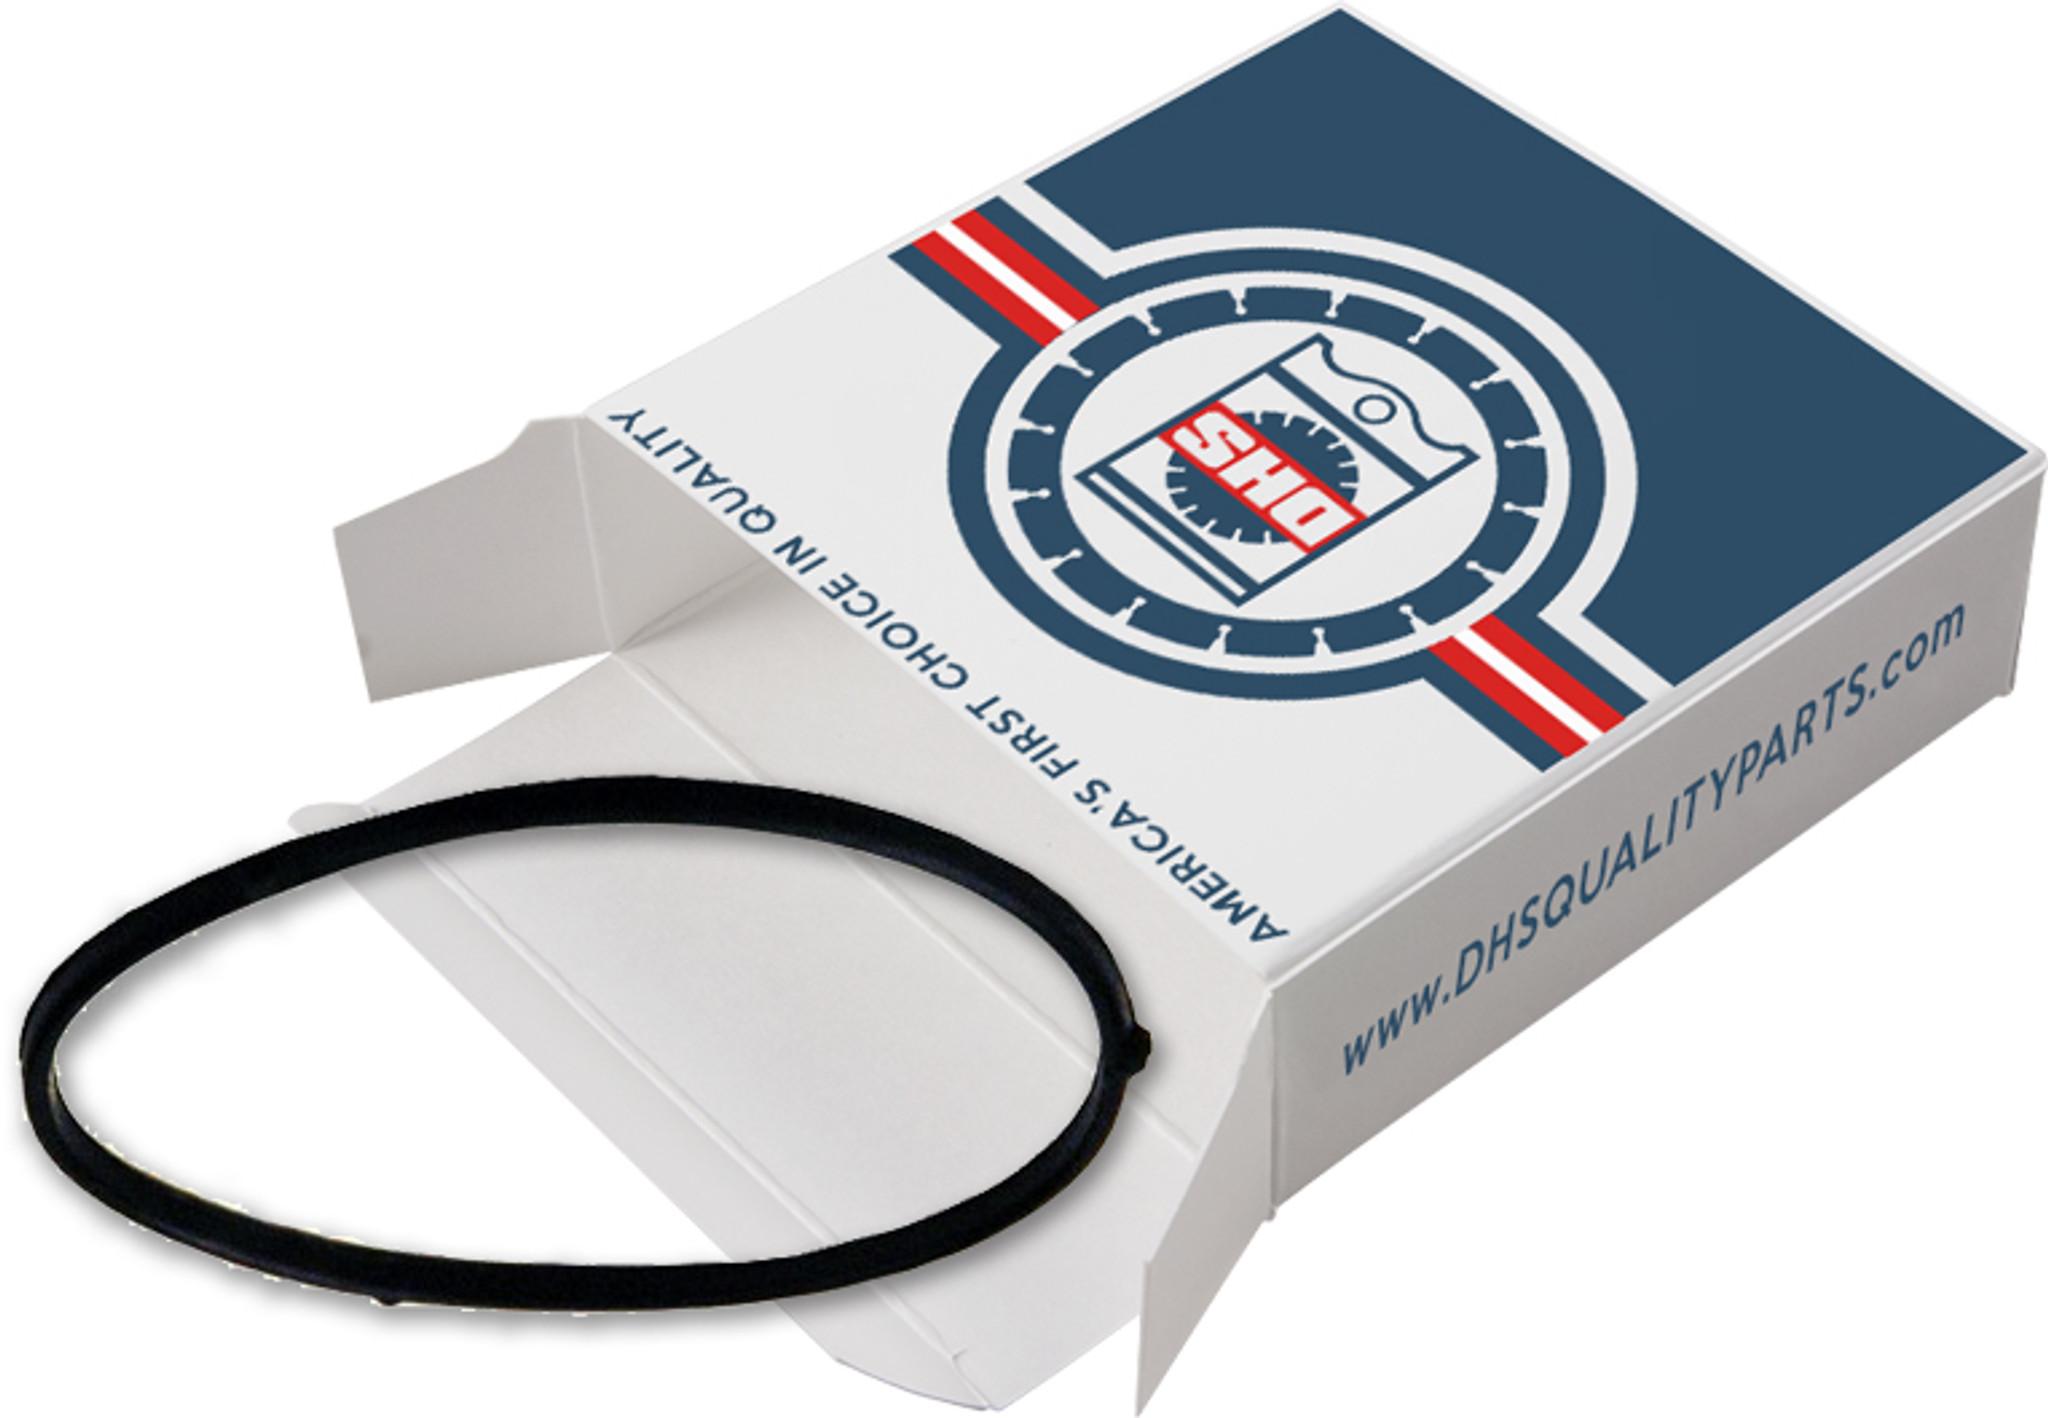 Air Filter Elbow Rubber Seal for Honda GX240 GX270 GX340 GX390